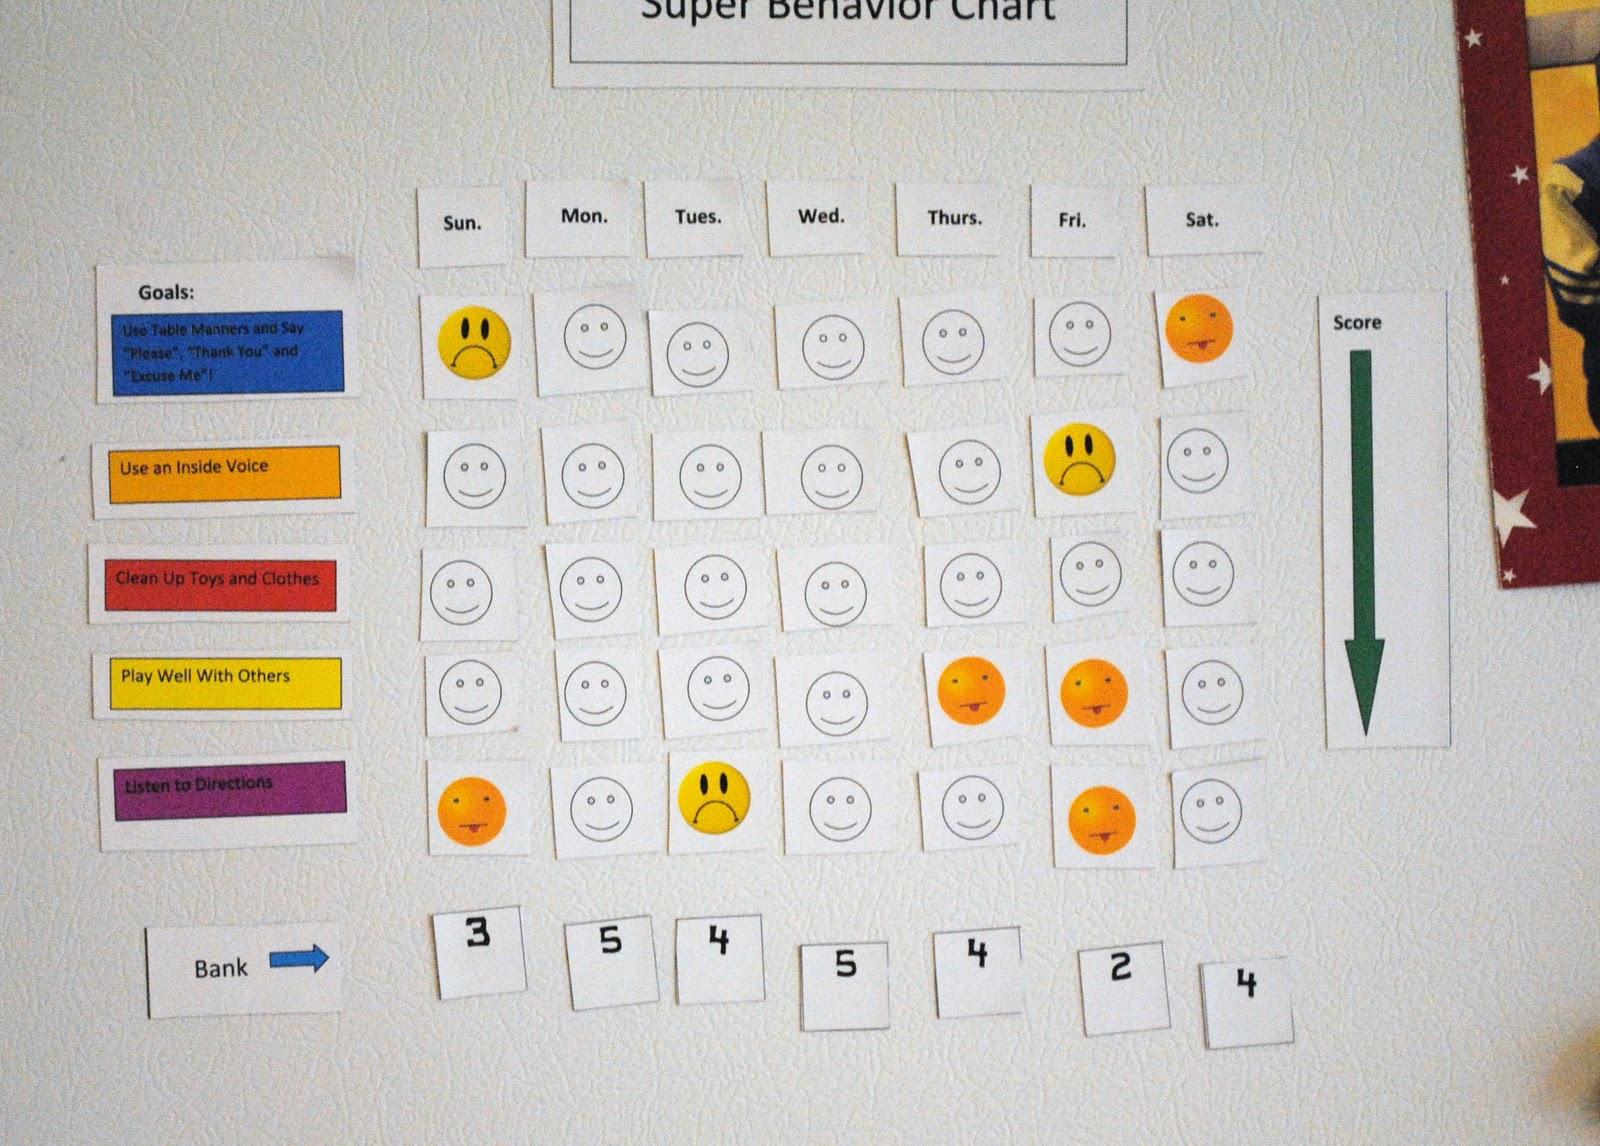 Magnetic behavior chart printable management tools also beatnik kids rh beatnikkids